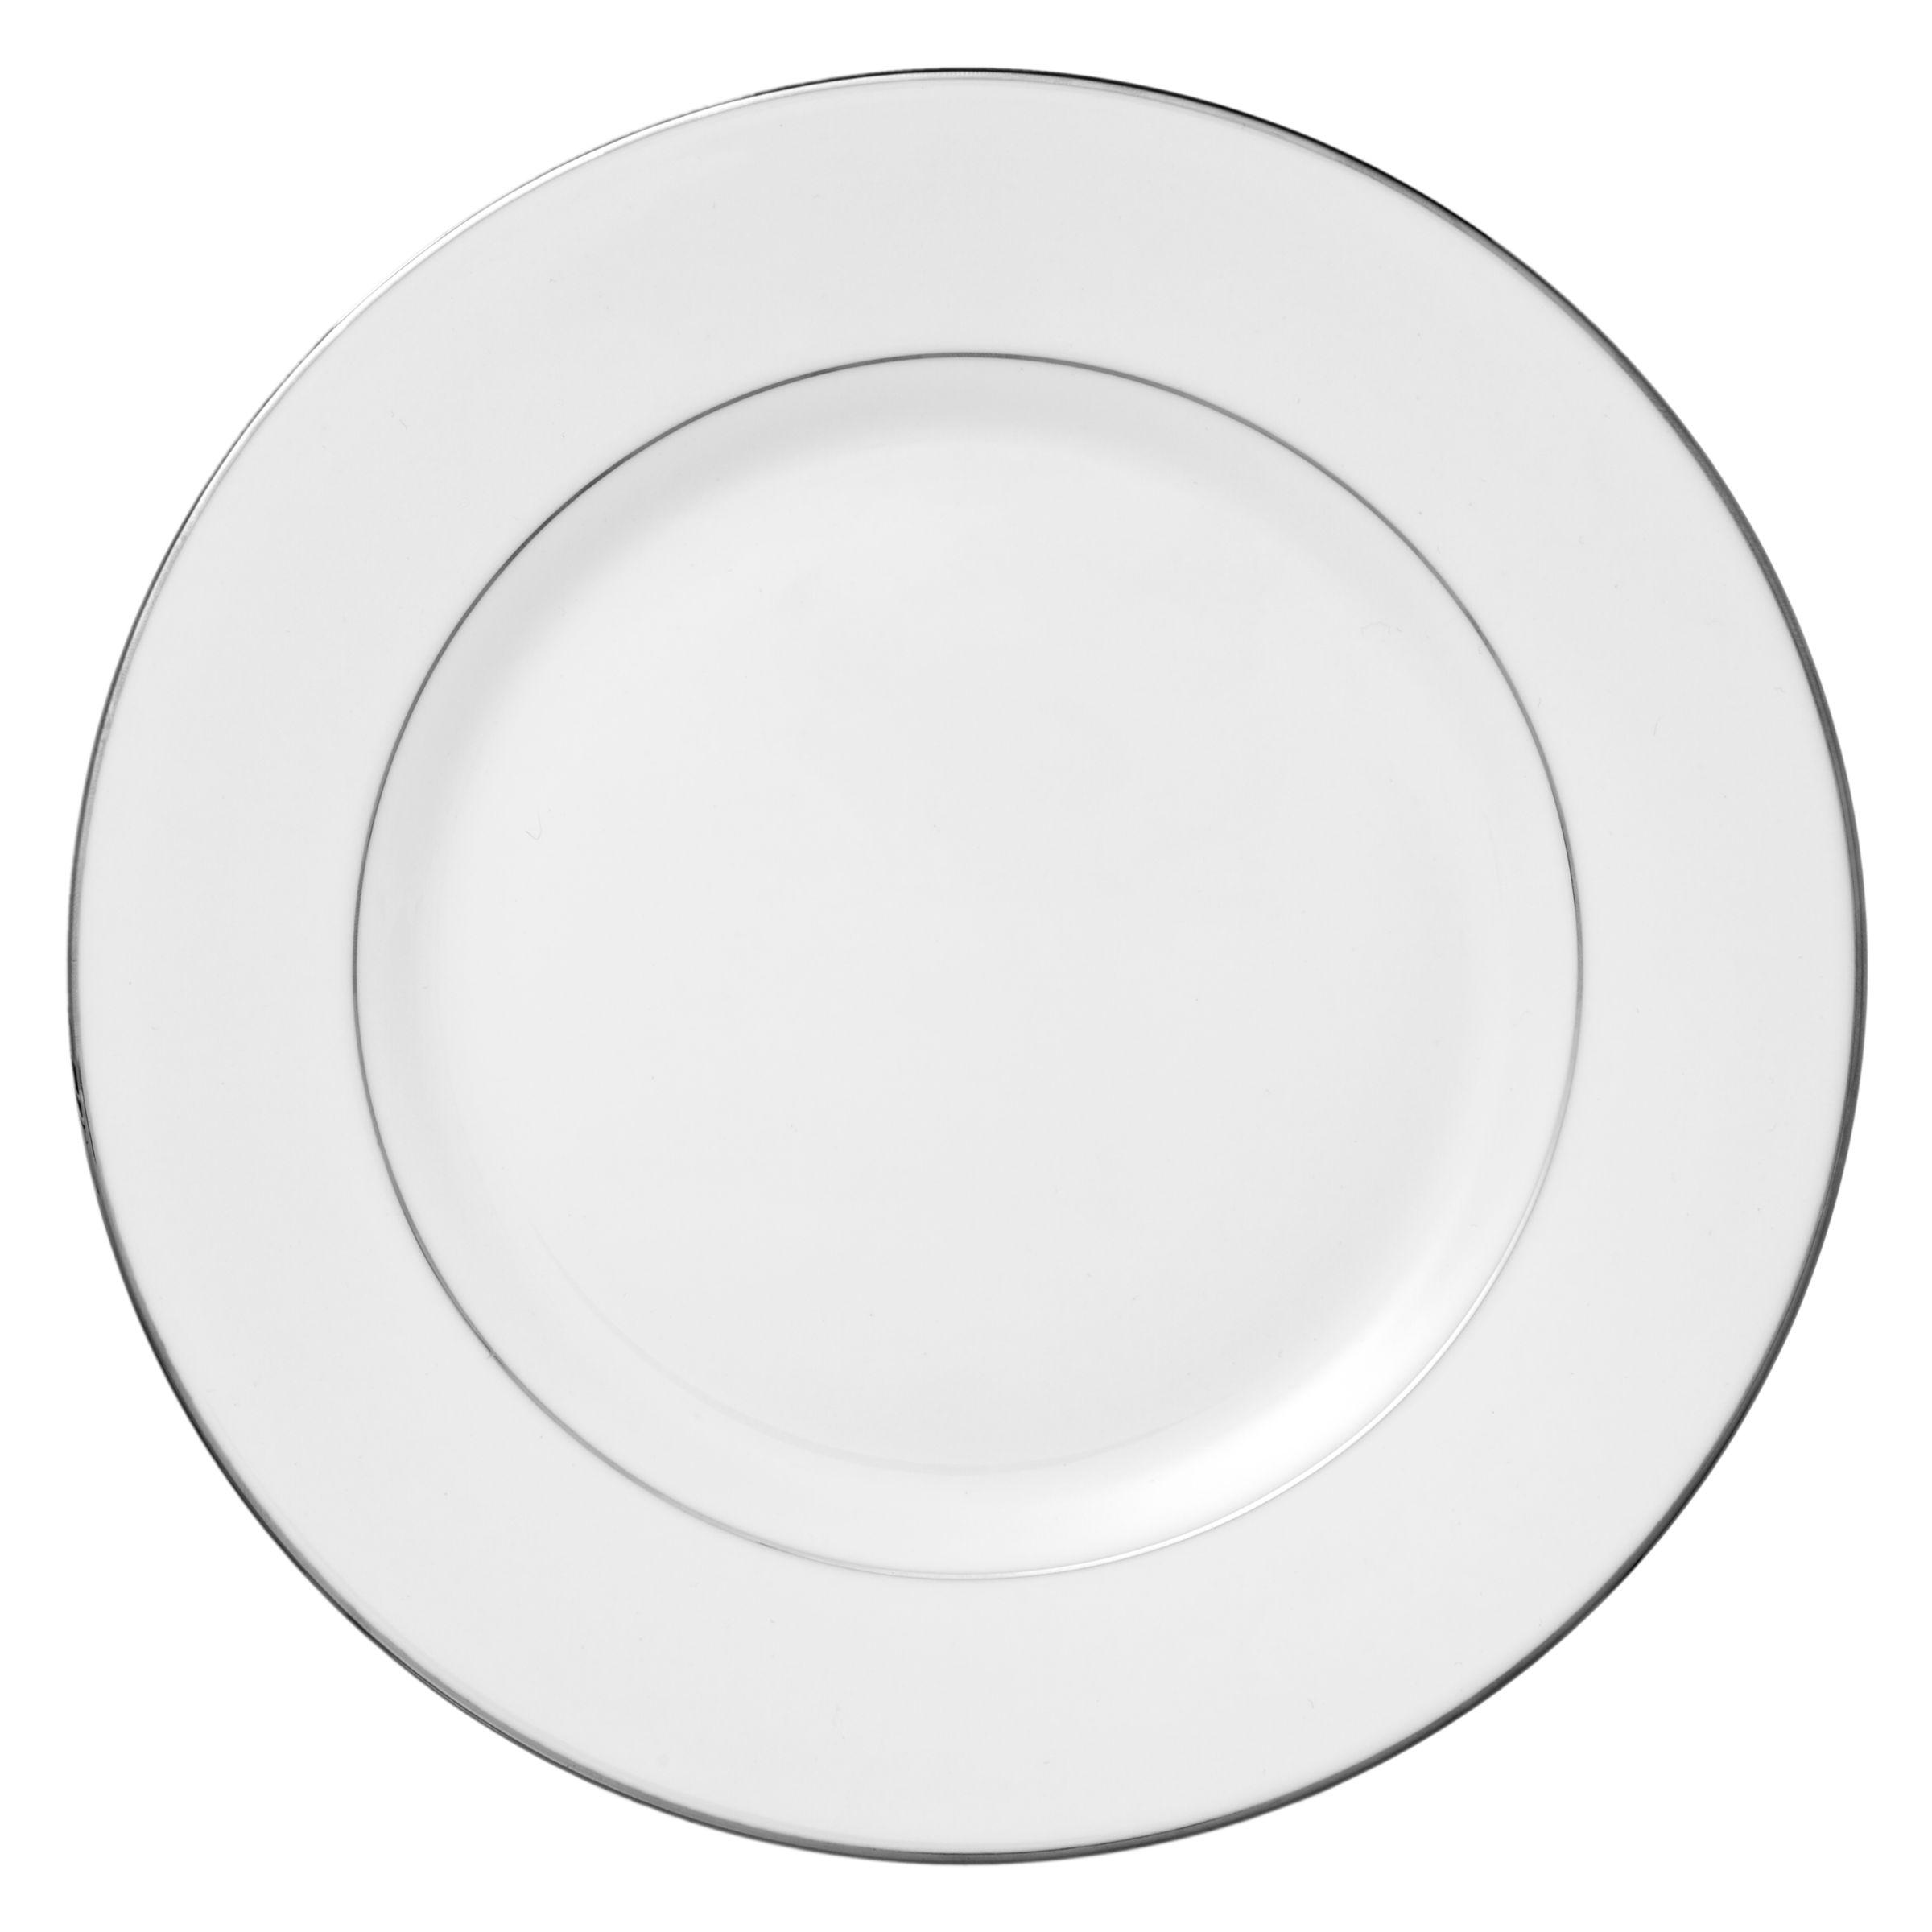 Wedgwood Wedgwood Signet Platinum Plate, Dia.20cm, White